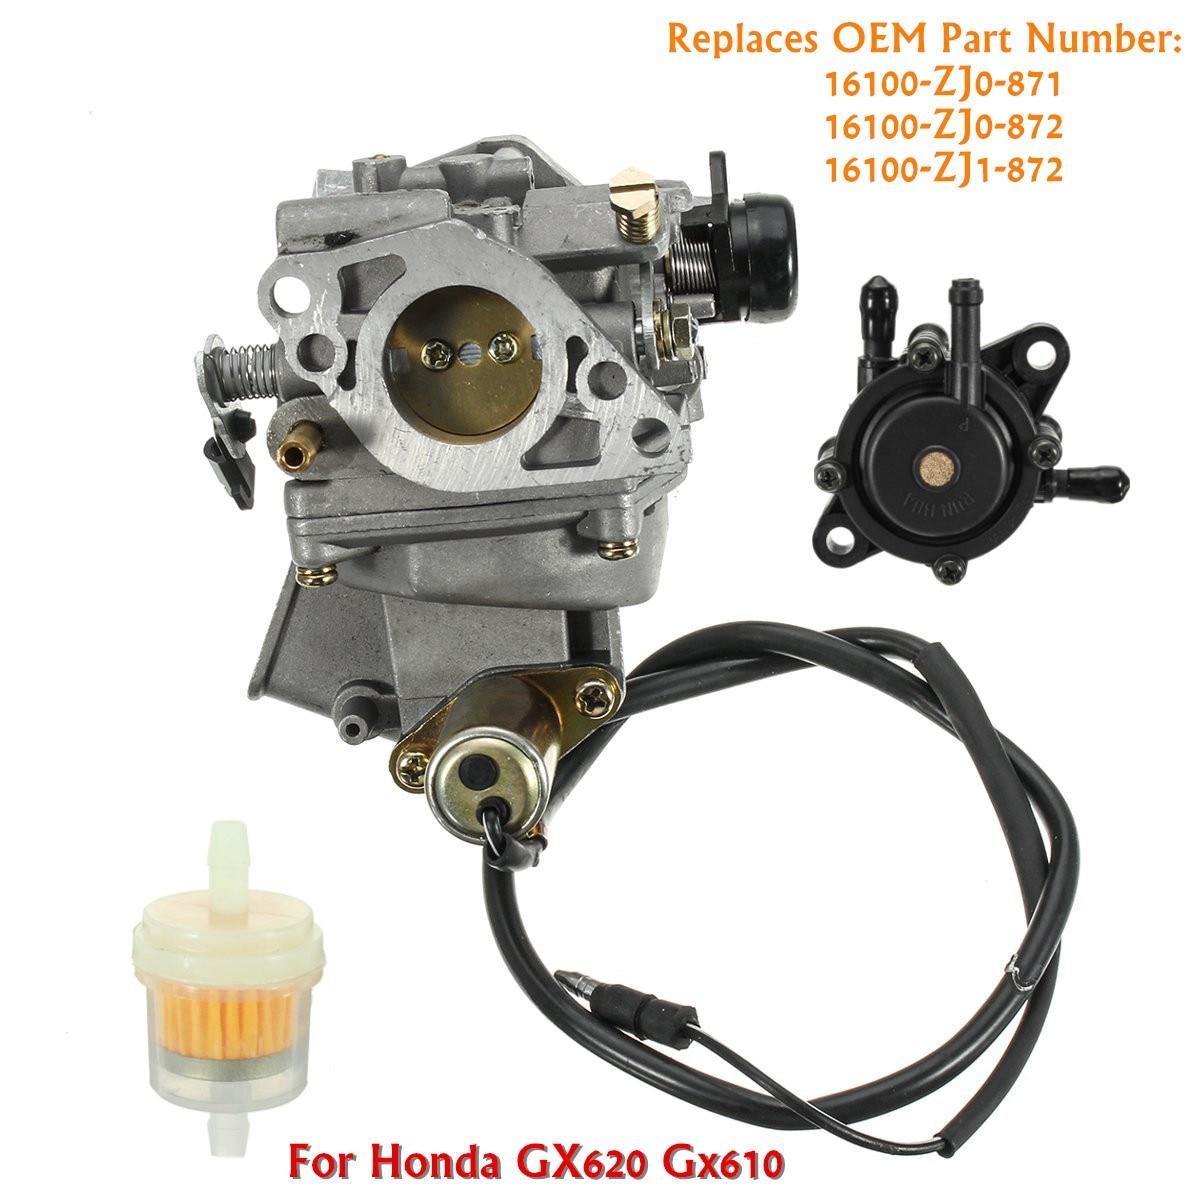 Carburetor Fuel Pump Filter Kits For Honda GX620 20HP GX610 18HP V Twin  Engine 16100 ZJ0 871 16100 ZJ0 872 16100 ZJ1 872-in Carburetors from  Automobiles ...